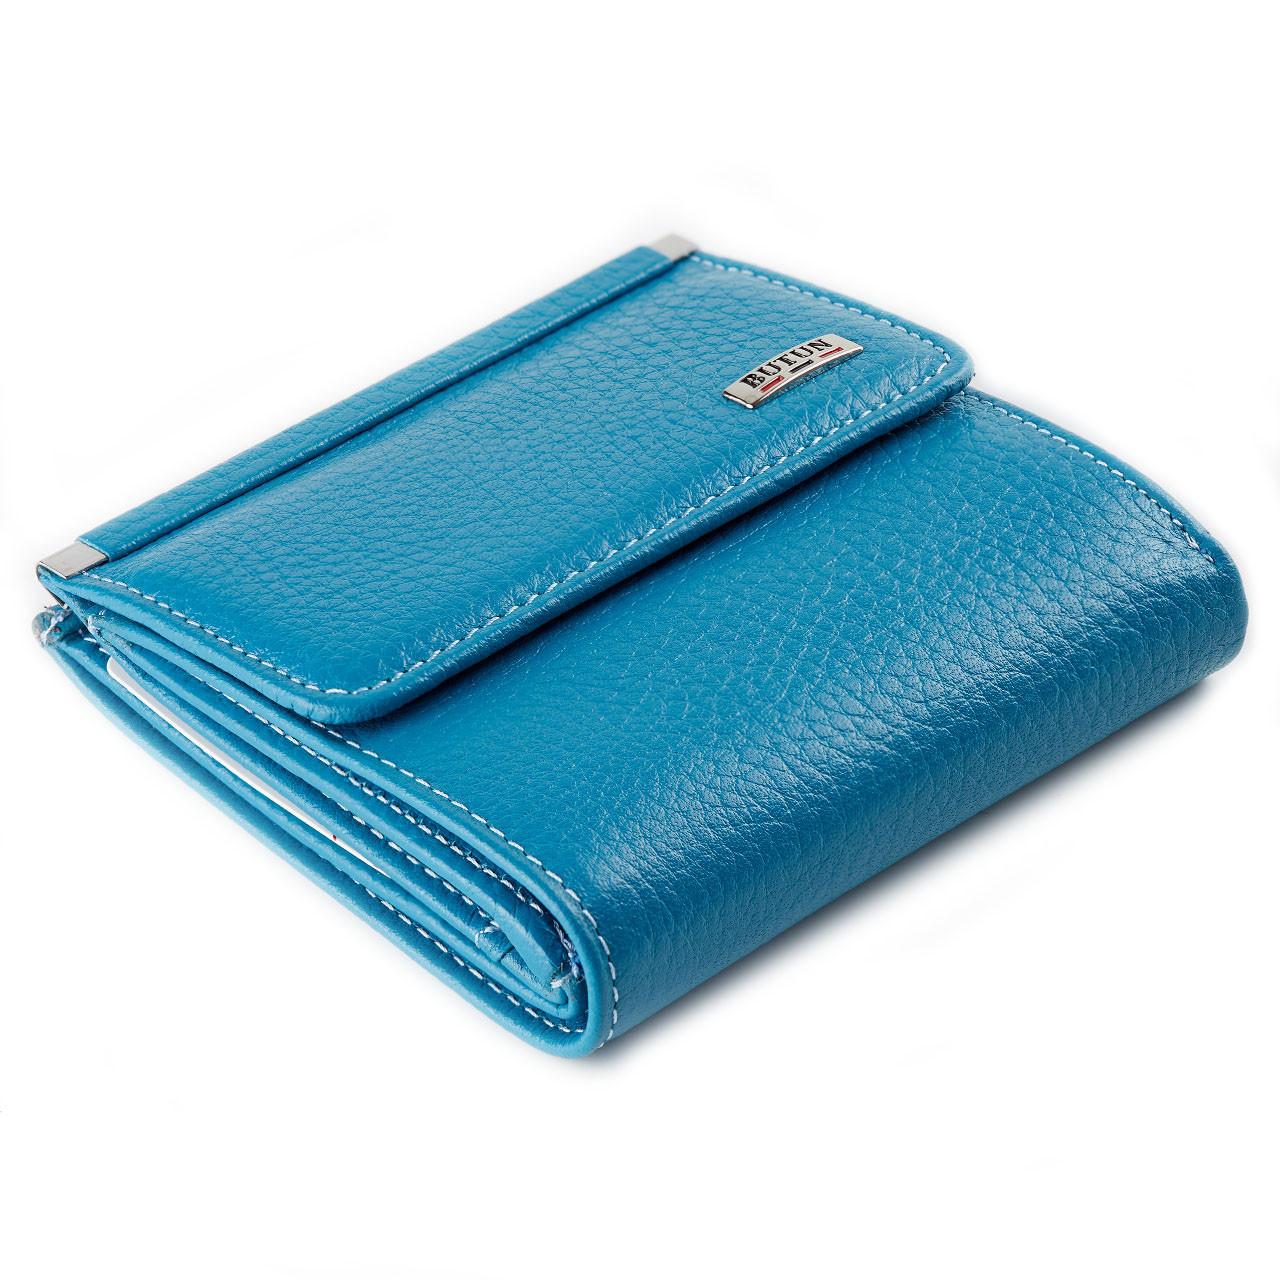 Женский кошелек Butun 590-004-050 кожаный бирюзовый